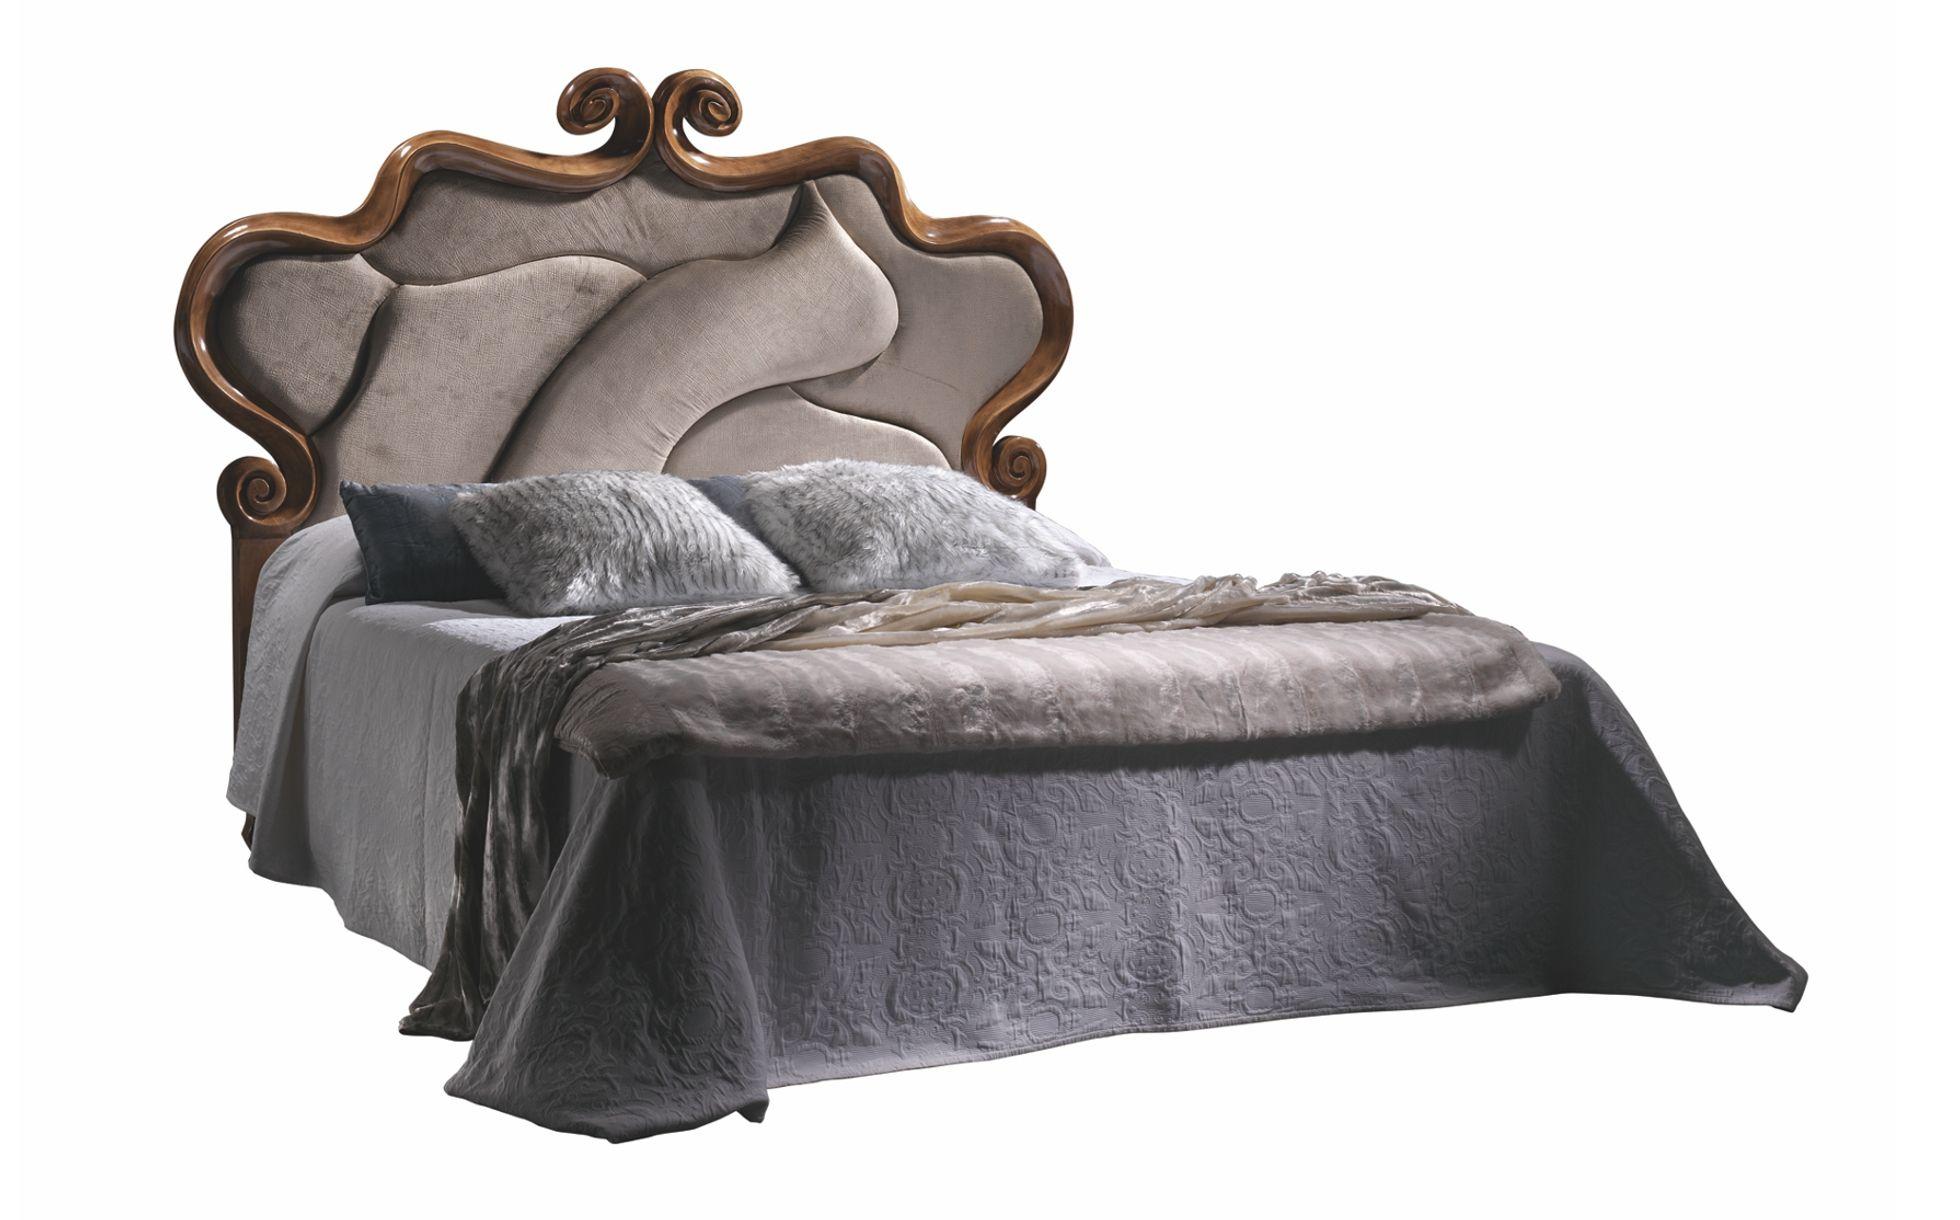 #headboard Ondas #Lolaglamour #furniture #decoration #bedroom #home #cabecero #decoracion #dormitorio